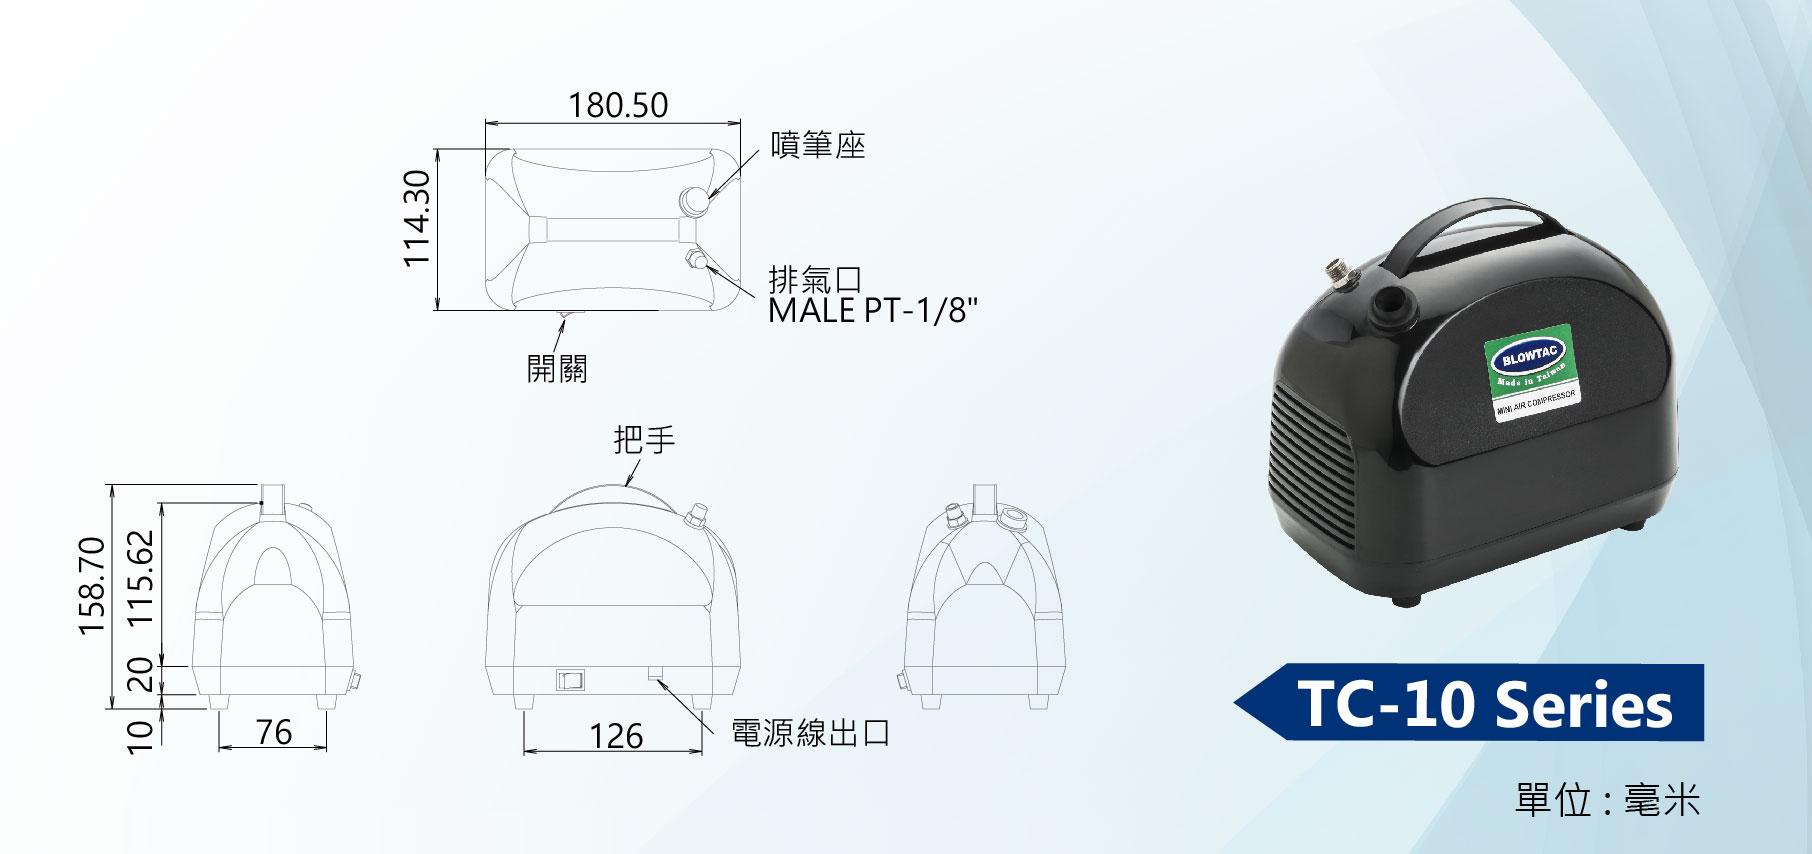 TC-10 Series Mini Air Compressors Dimension